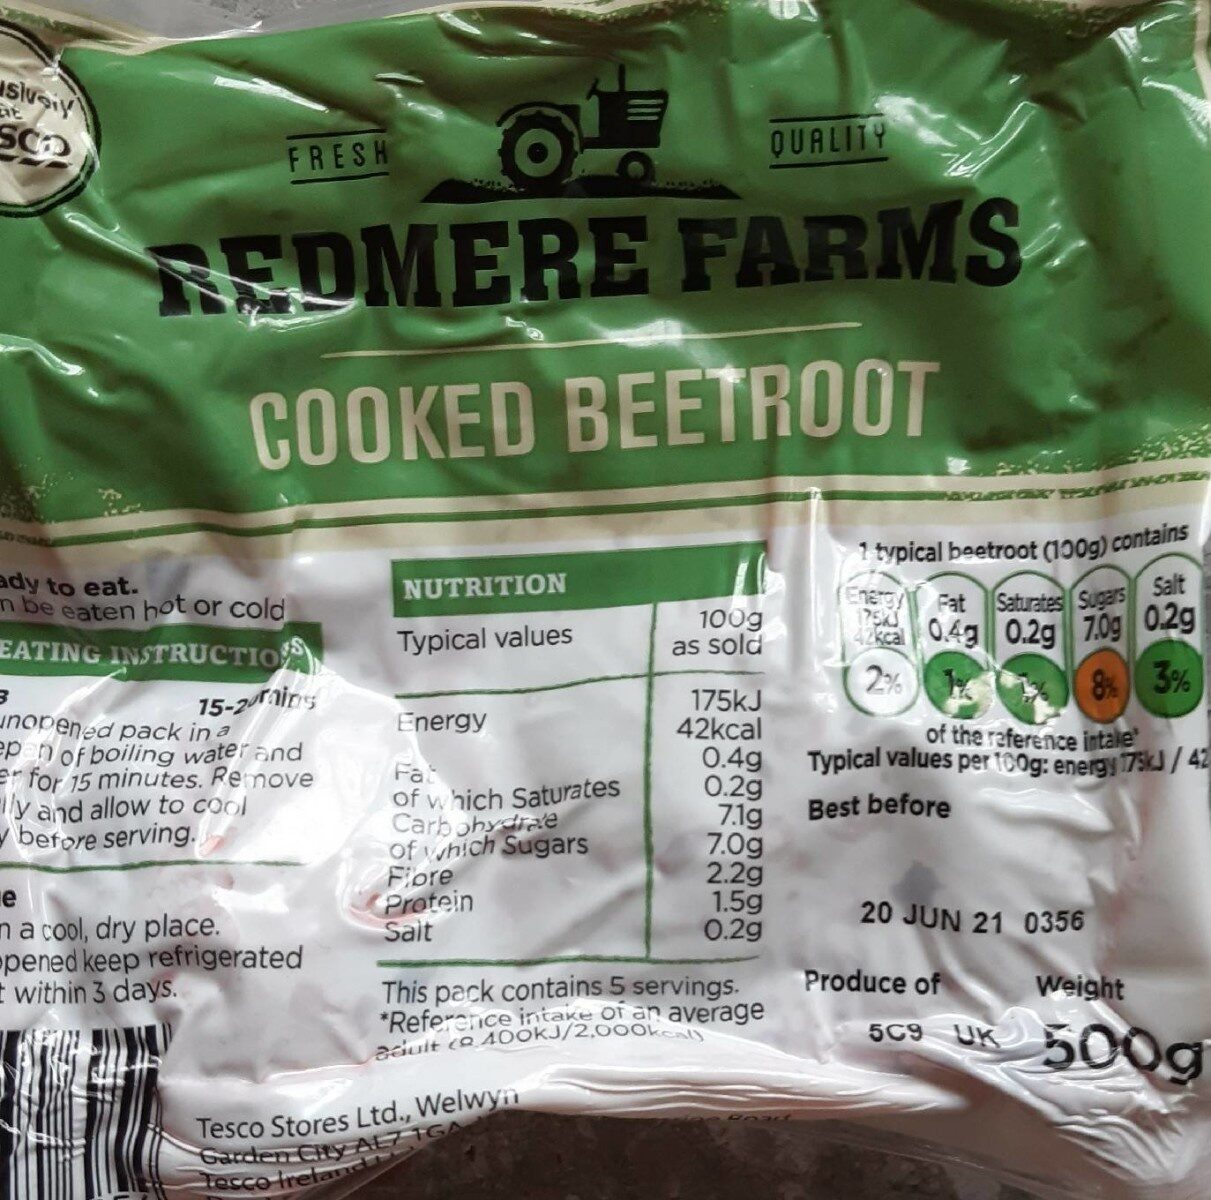 Redmere farms - Prodotto - en